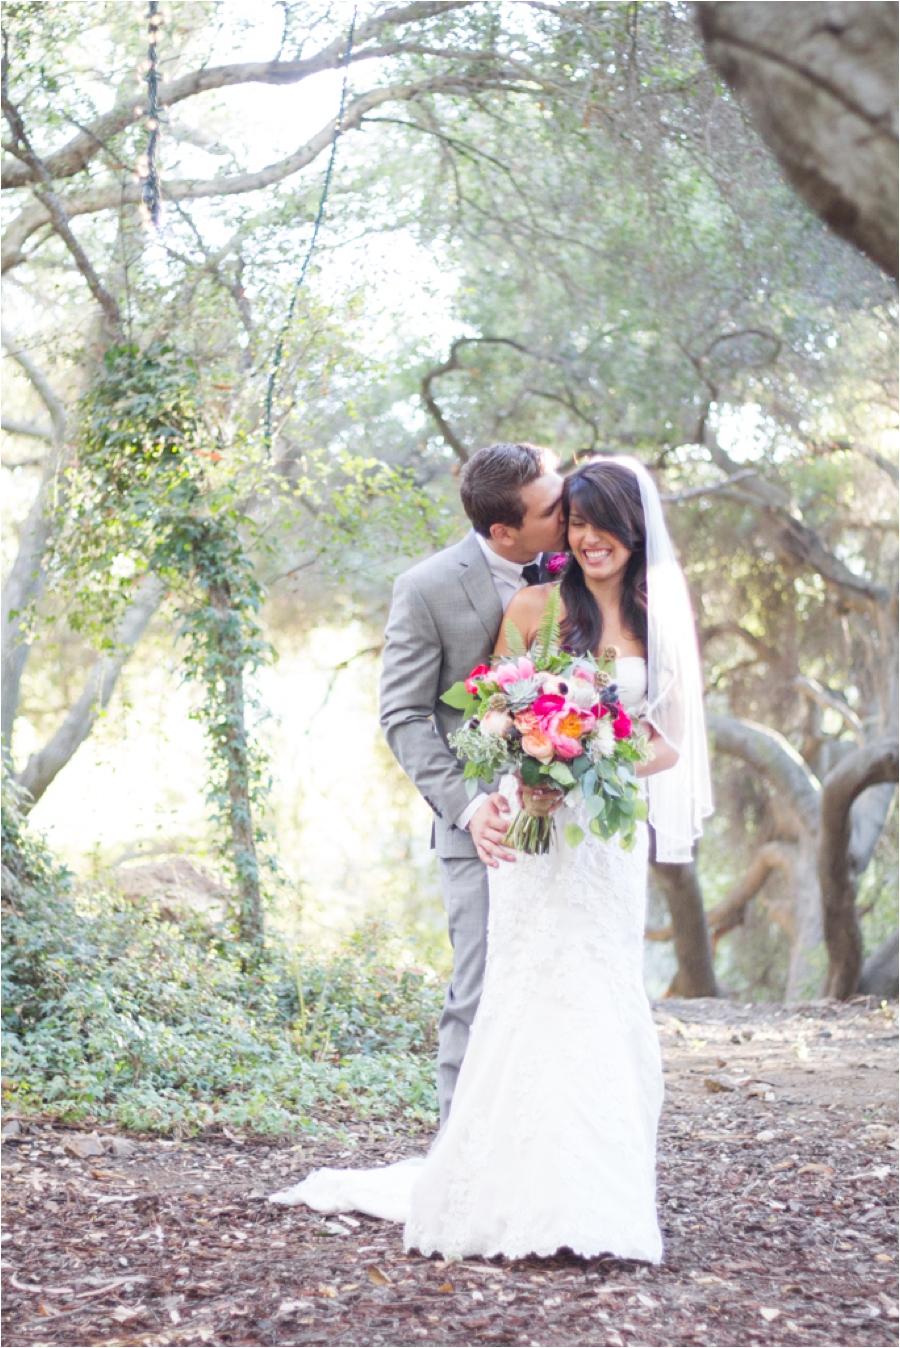 Jasmine and Donny- Calamigos Ranch Wedding ©Shaun and Skyla Walton-290.jpg